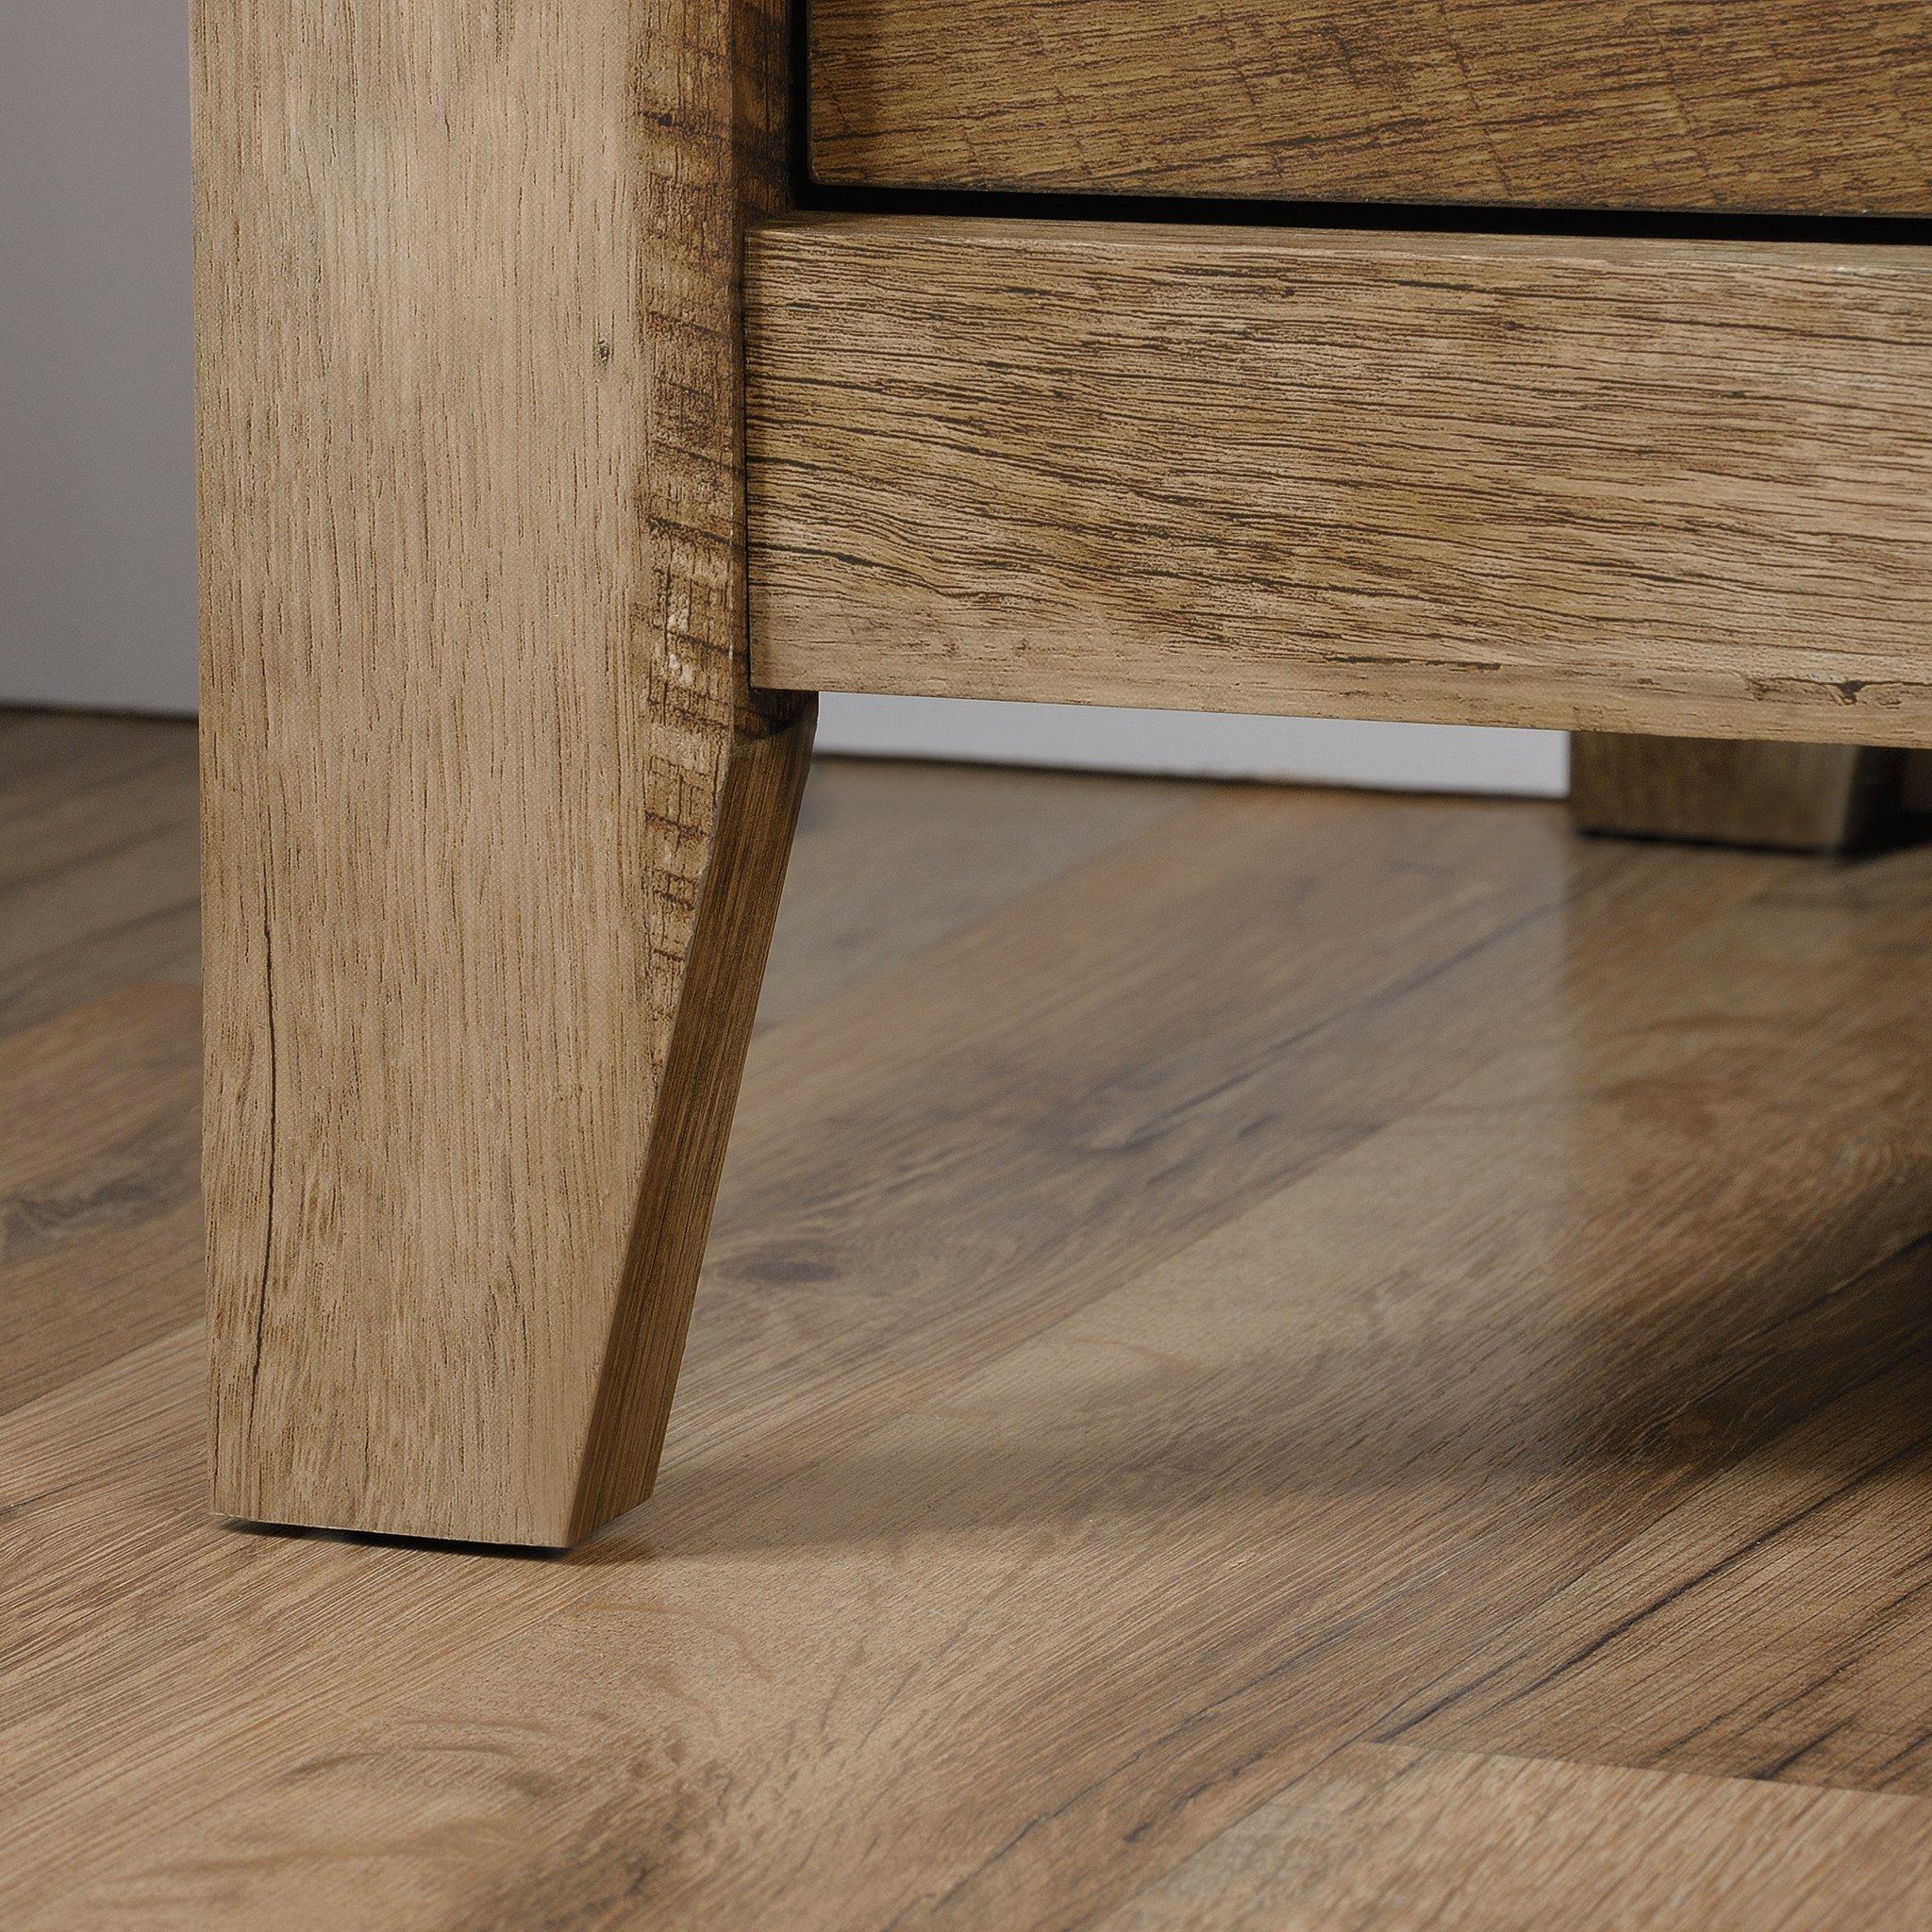 Sauder 419077 Dakota Pass Armoire, 33.78'' L x 19.53'' W x 57.84'' H, Craftsman Oak finish by Sauder (Image #11)